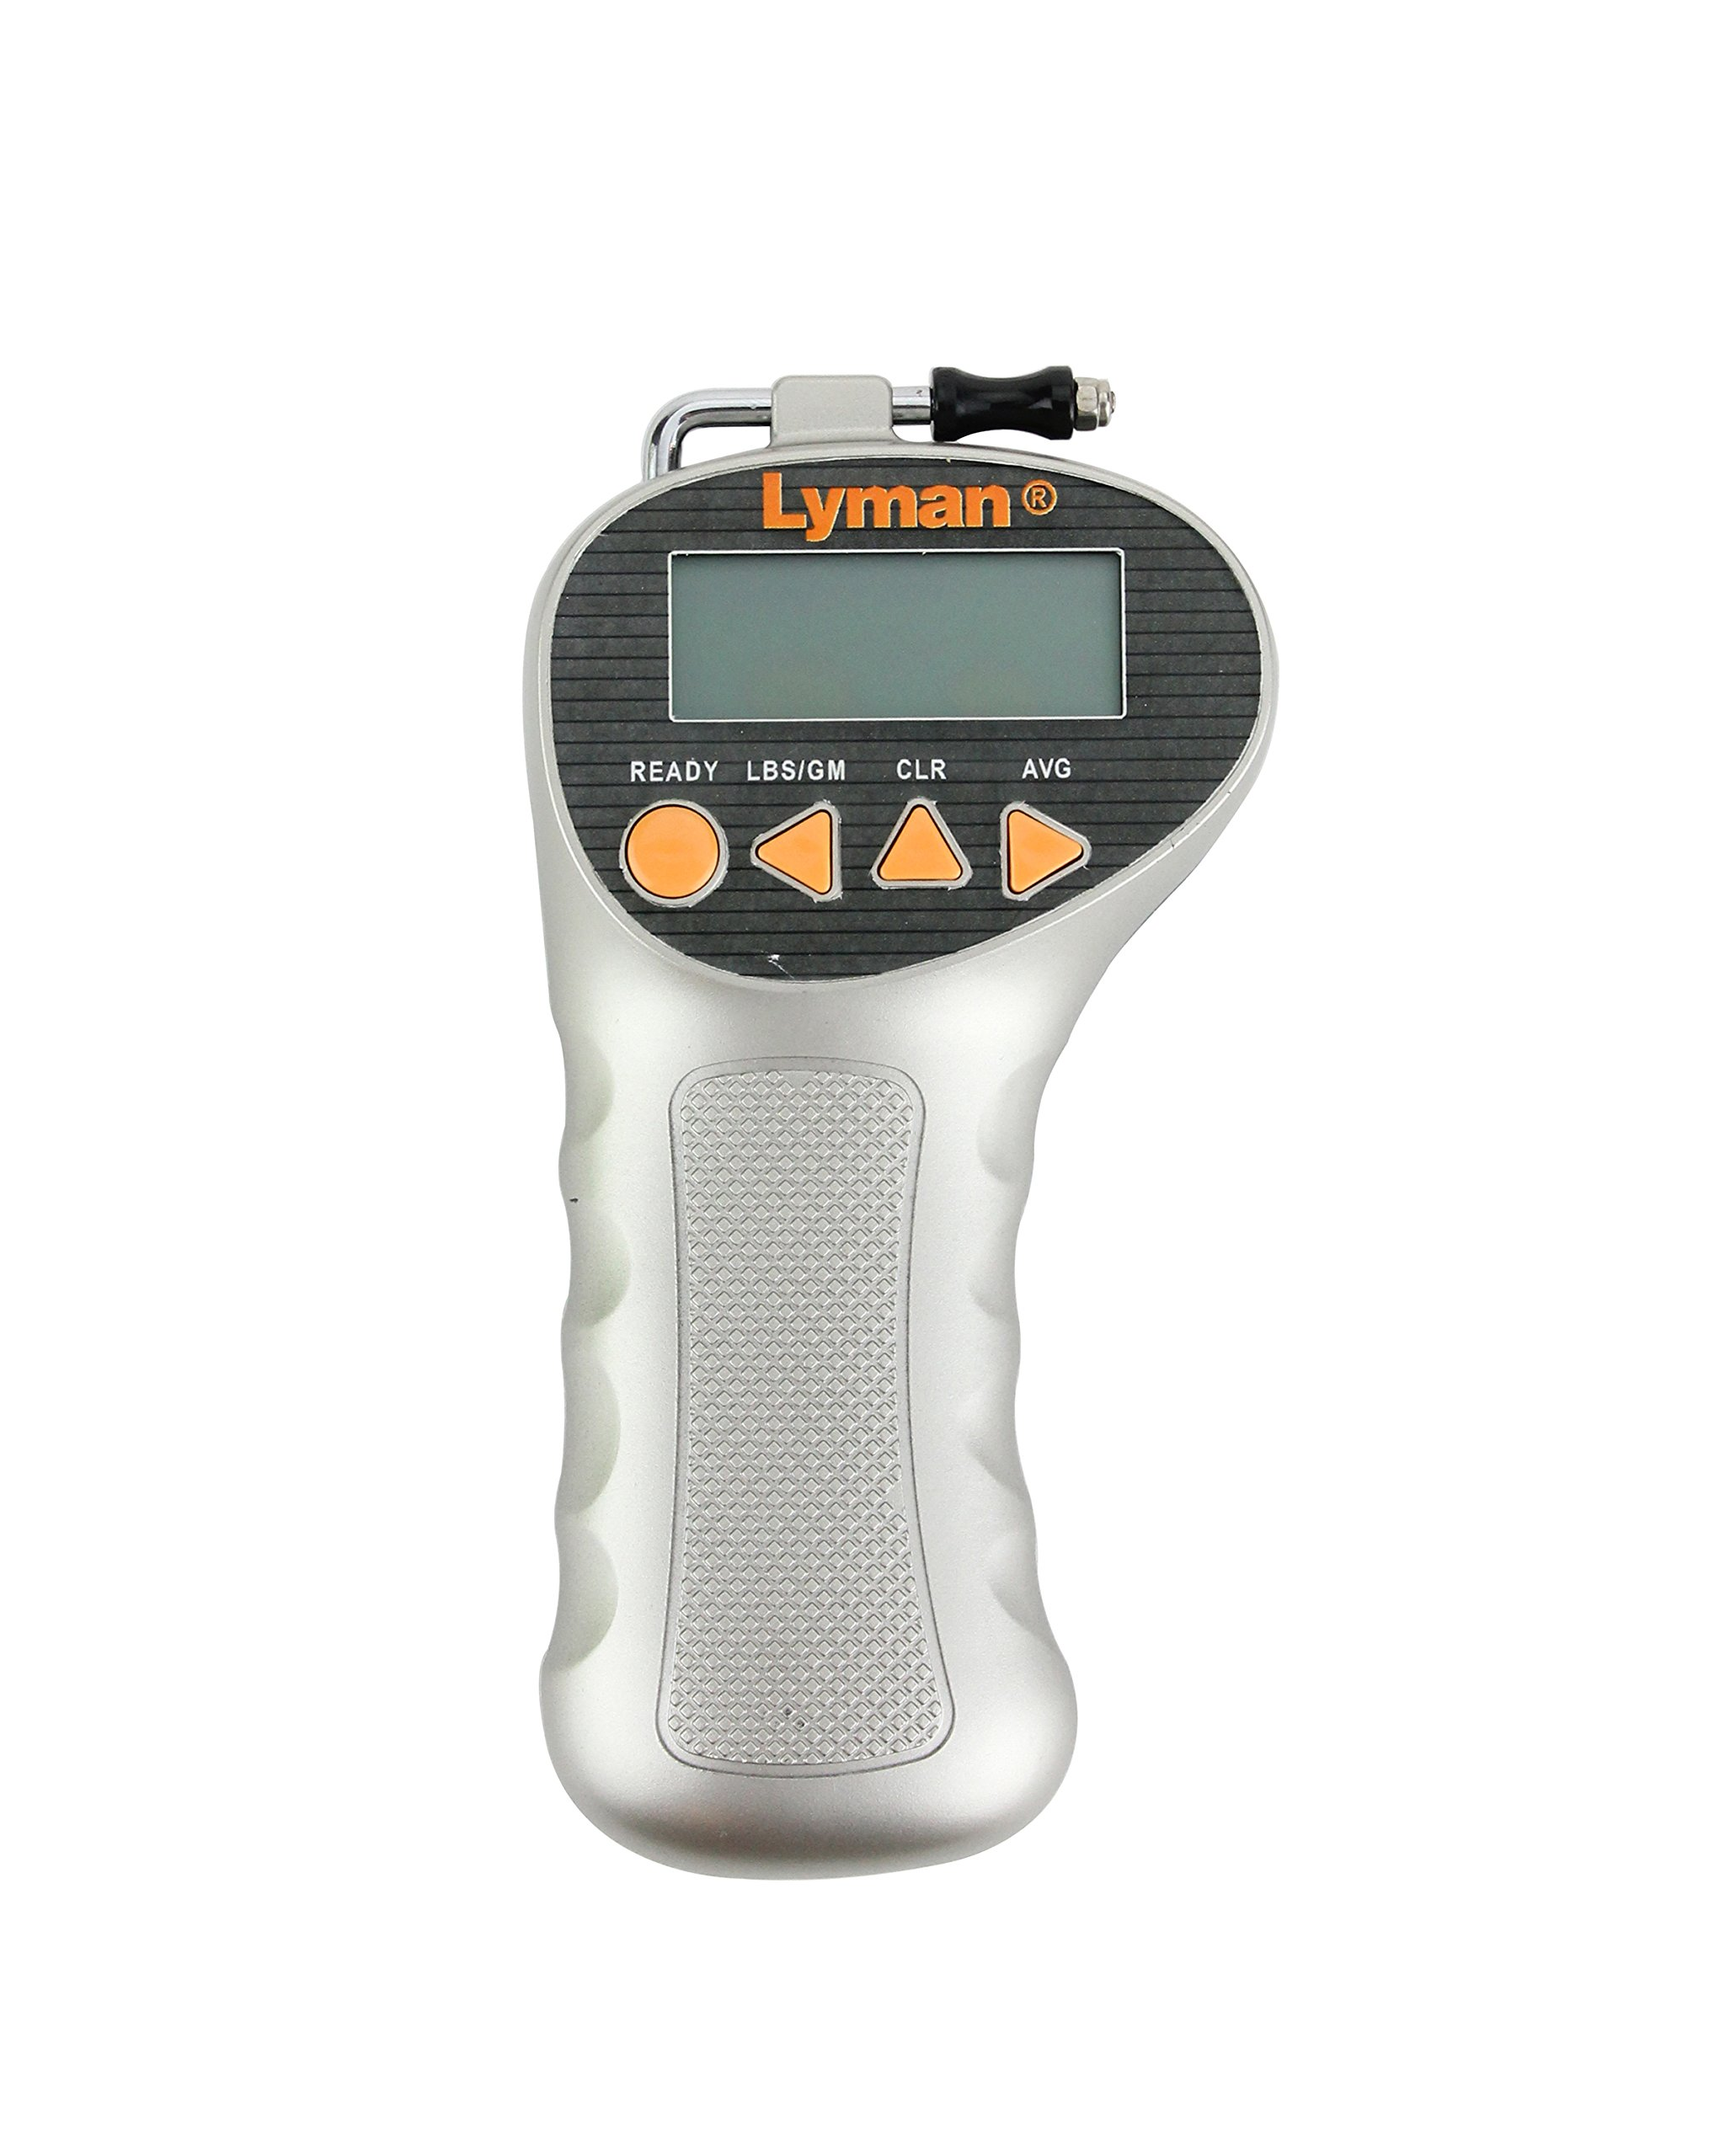 Lyman 7832248 Electronic Digital Trigger Pull Gauge